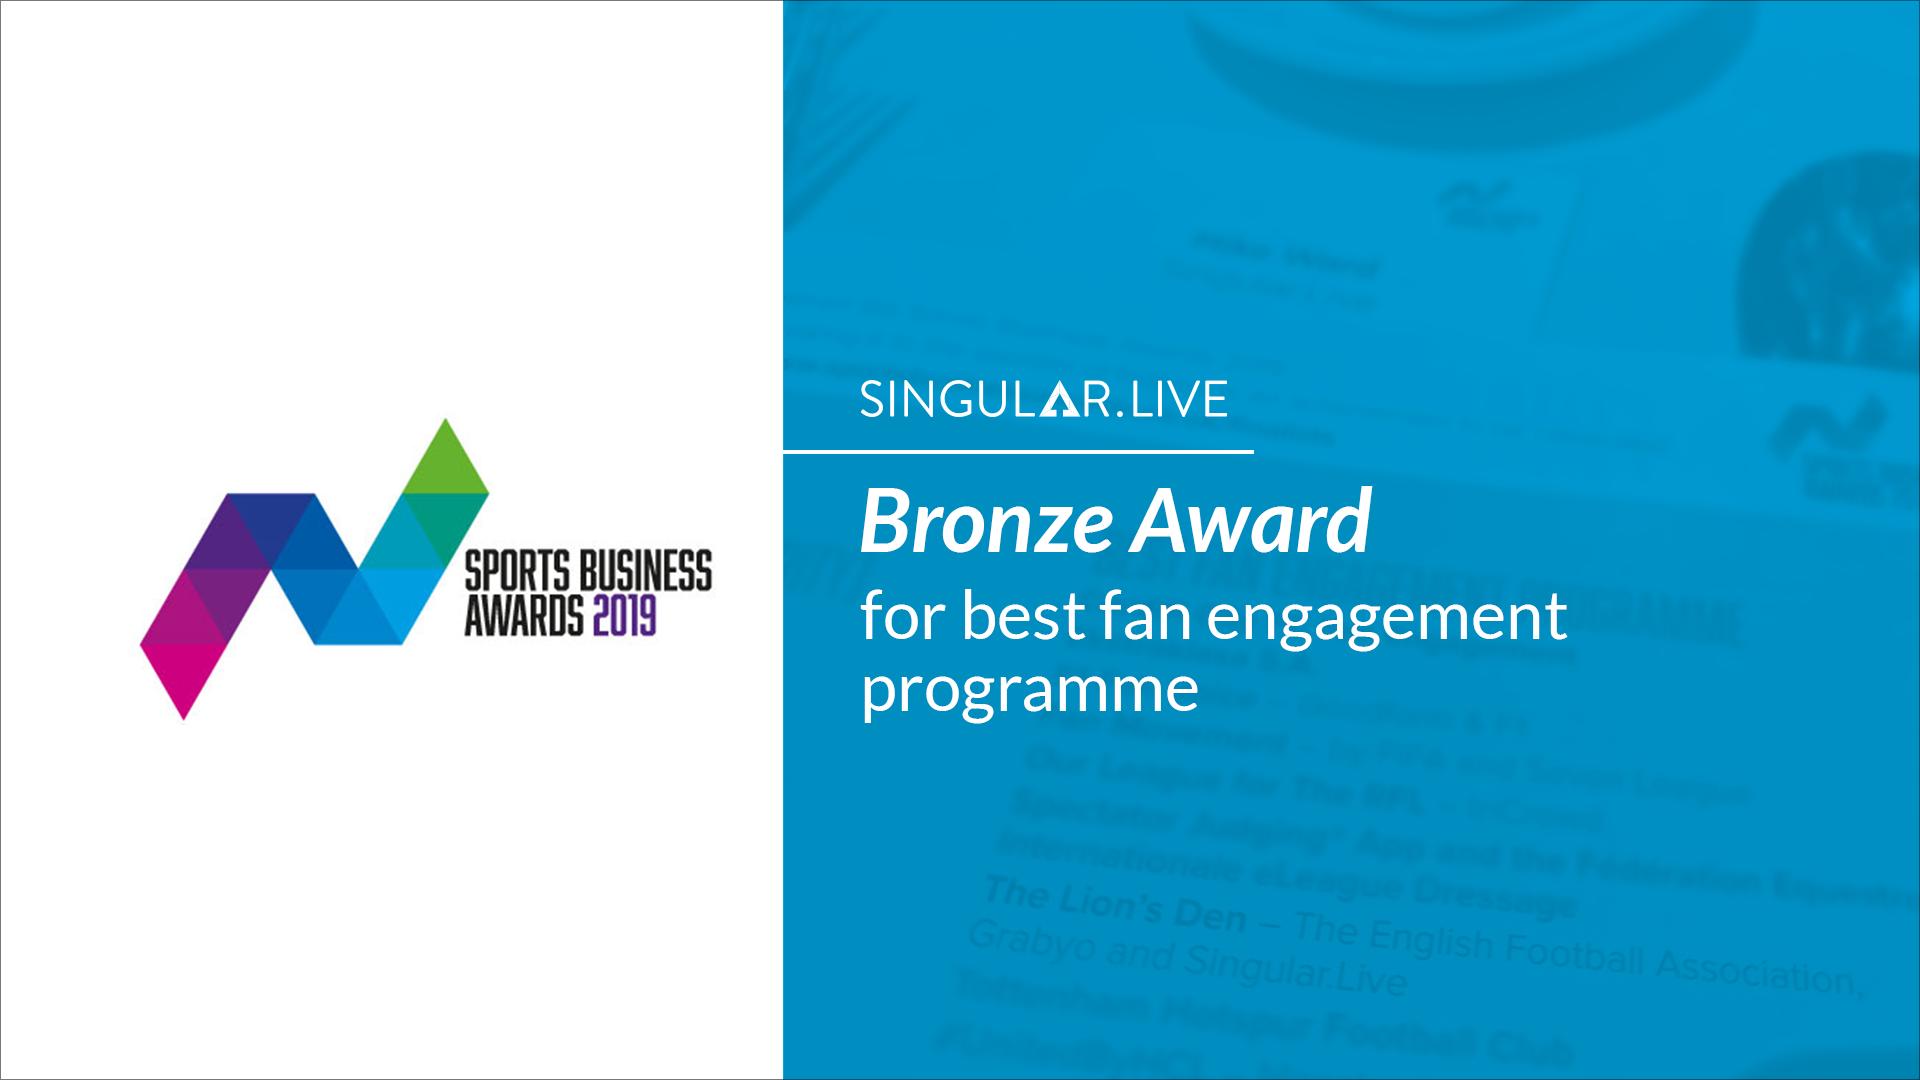 Singular Wins at Sports Business Awards